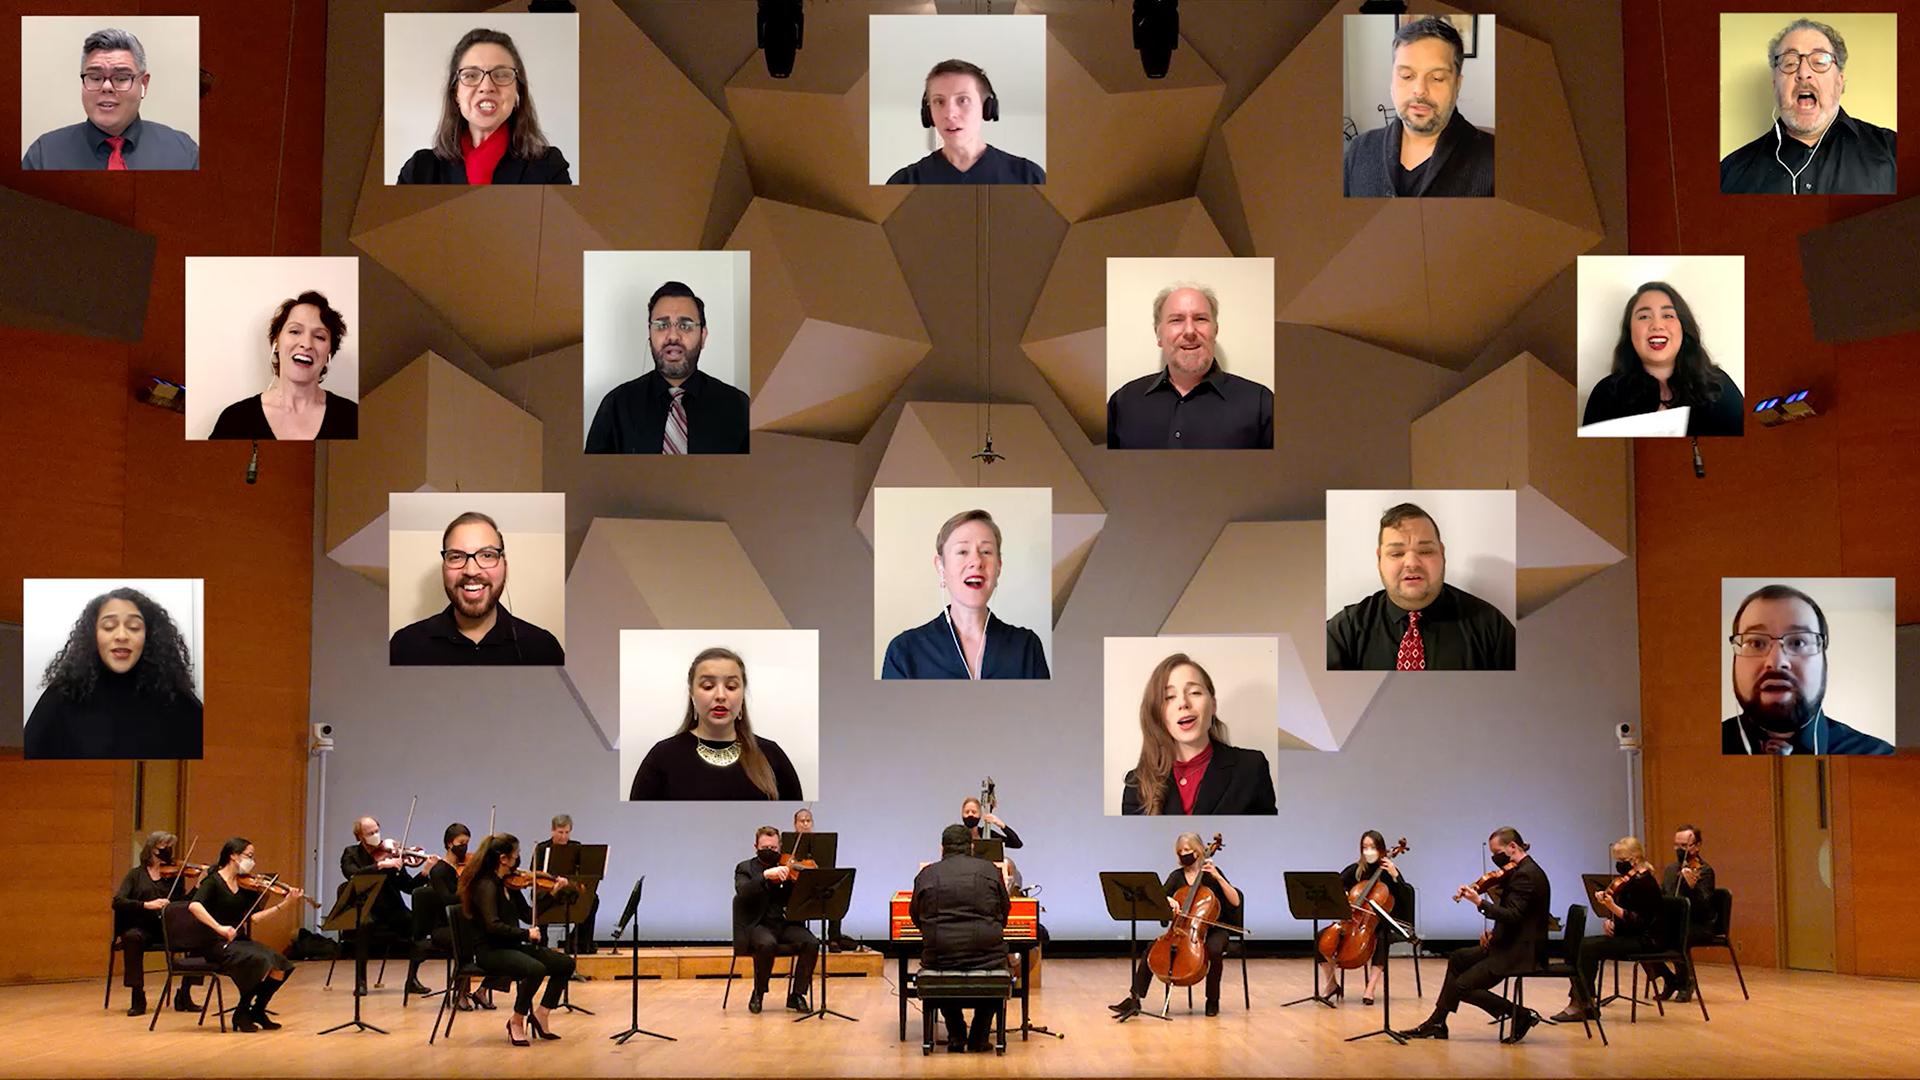 Minnsota orchestra virtual concert